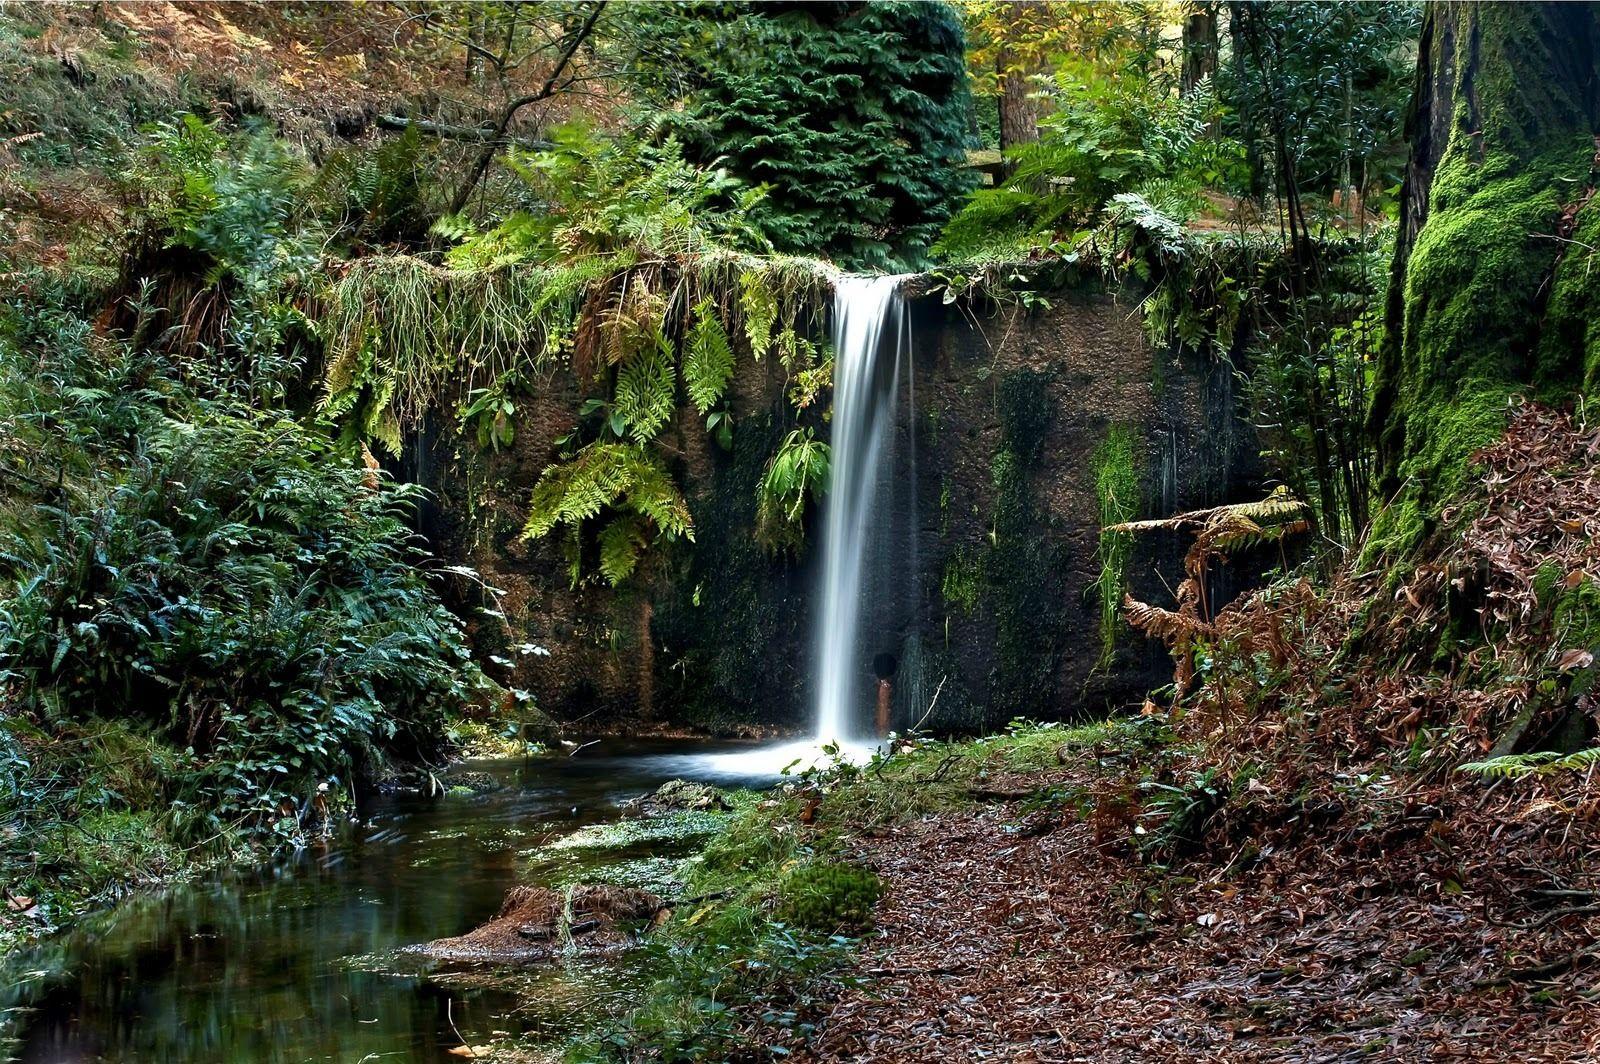 Monte Aloia Nature Park Spain | ... da Cabana (Traditional Cache) in Galicia, Spain created by Geoaventura